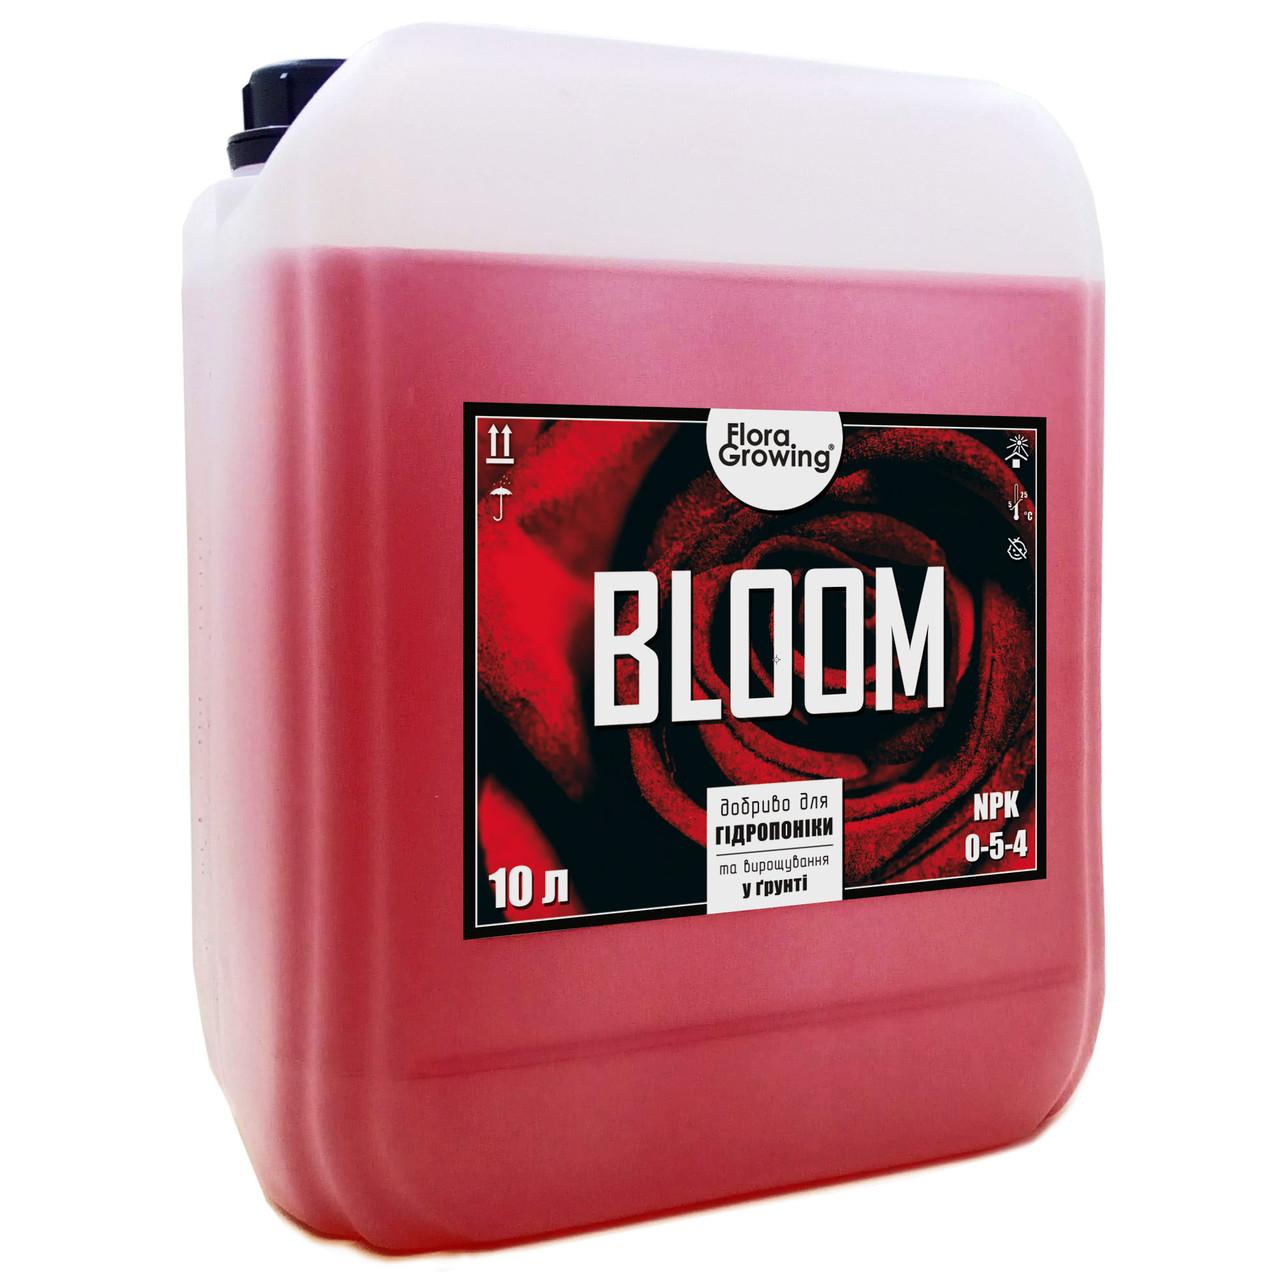 10 л Bloom - компонент удобрений для гидропоники и почвы аналог GHE